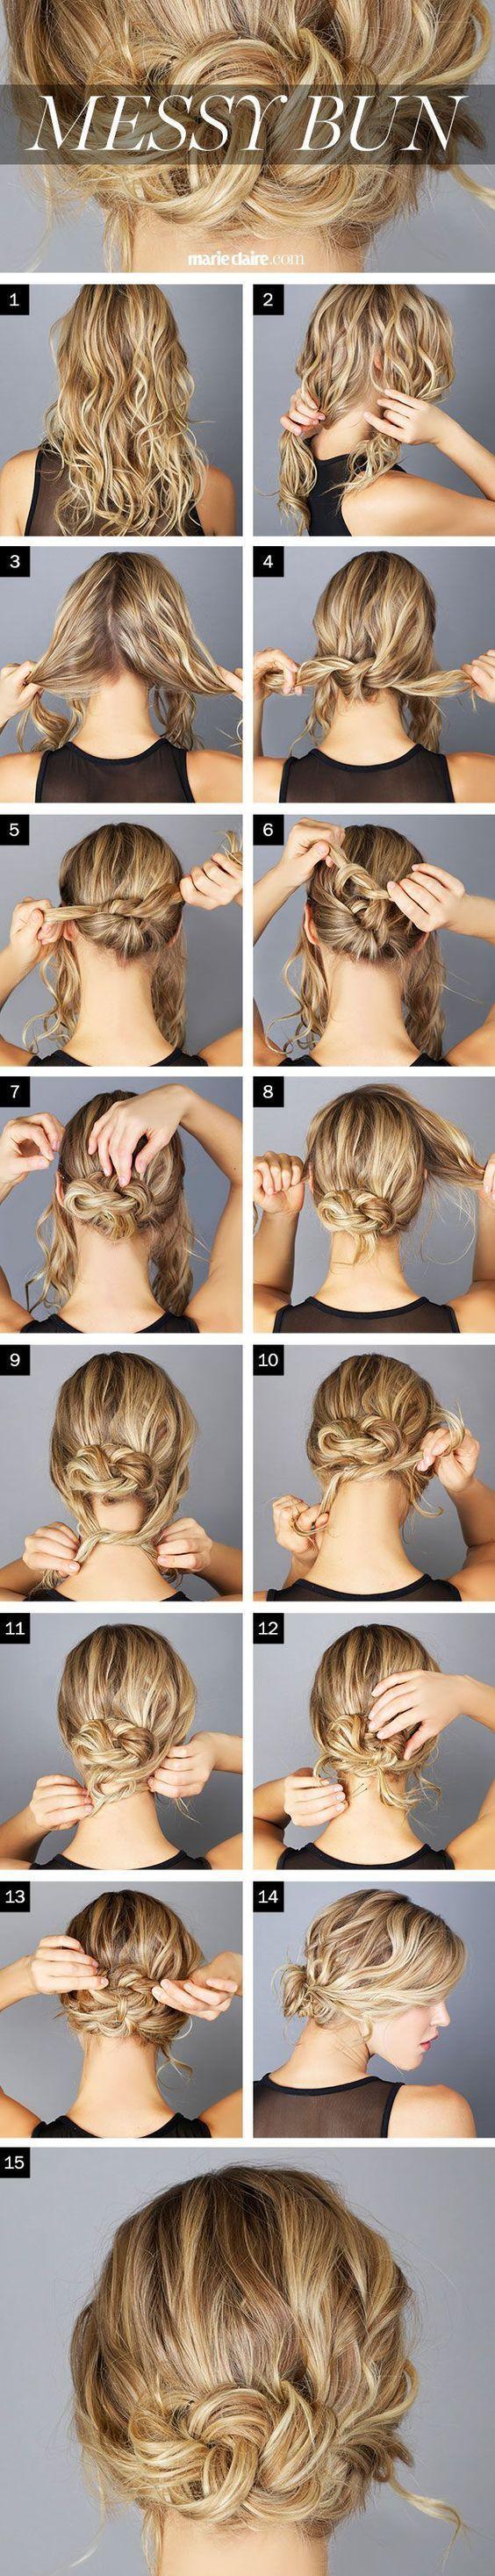 Messy Bun Tutorial for Long Hair